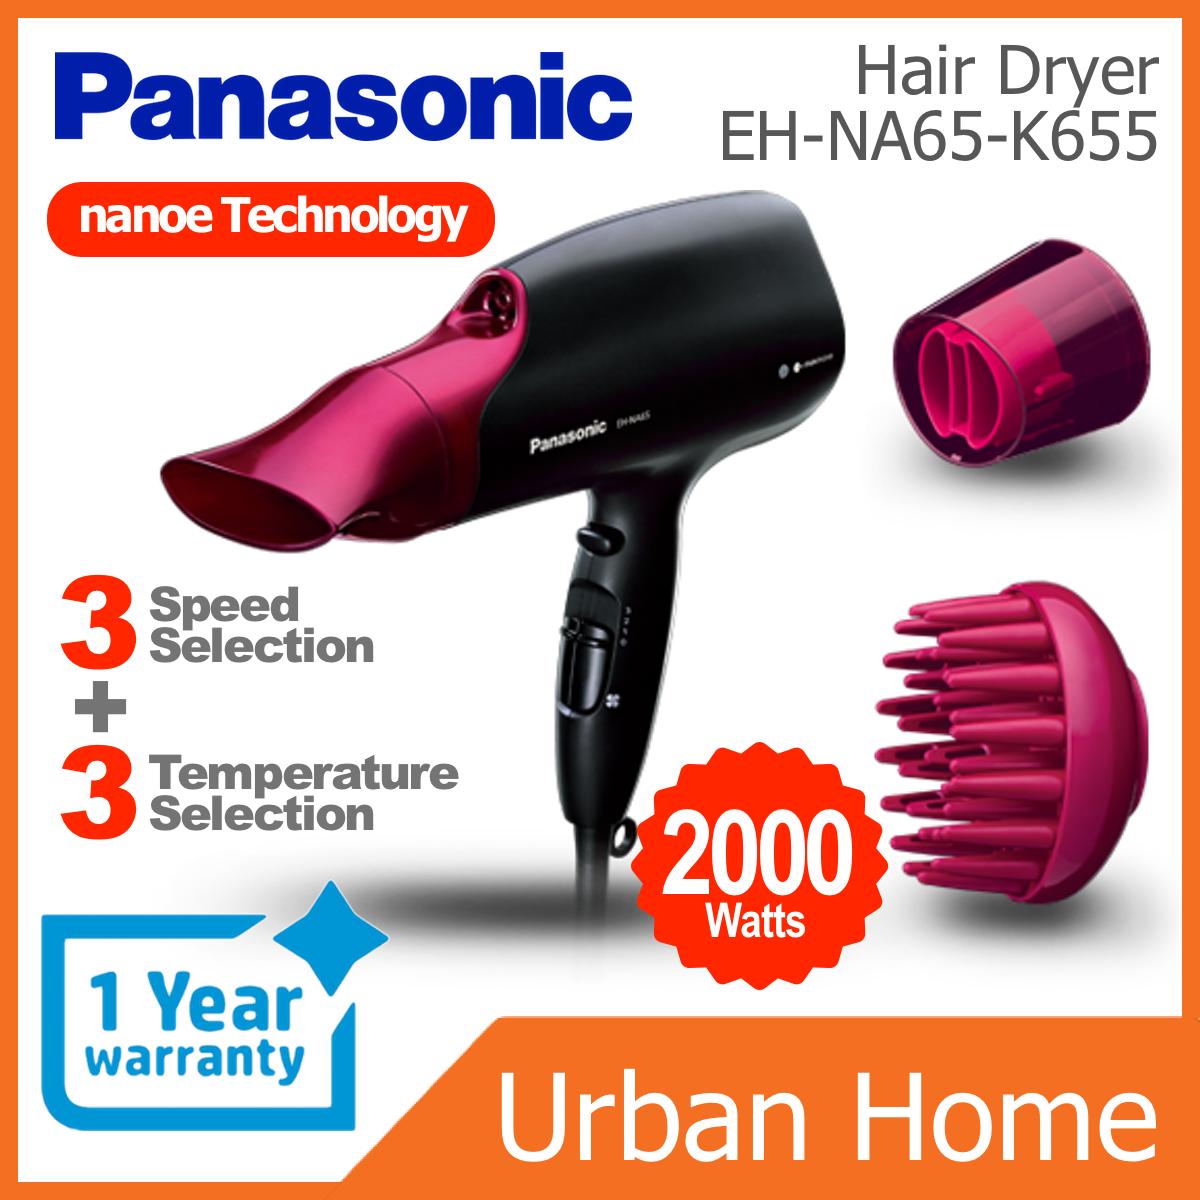 PANASONIC 2000w nanoe Technology Hair Dryer (EH-NA65/EH-NA65-K655/EHNA65)